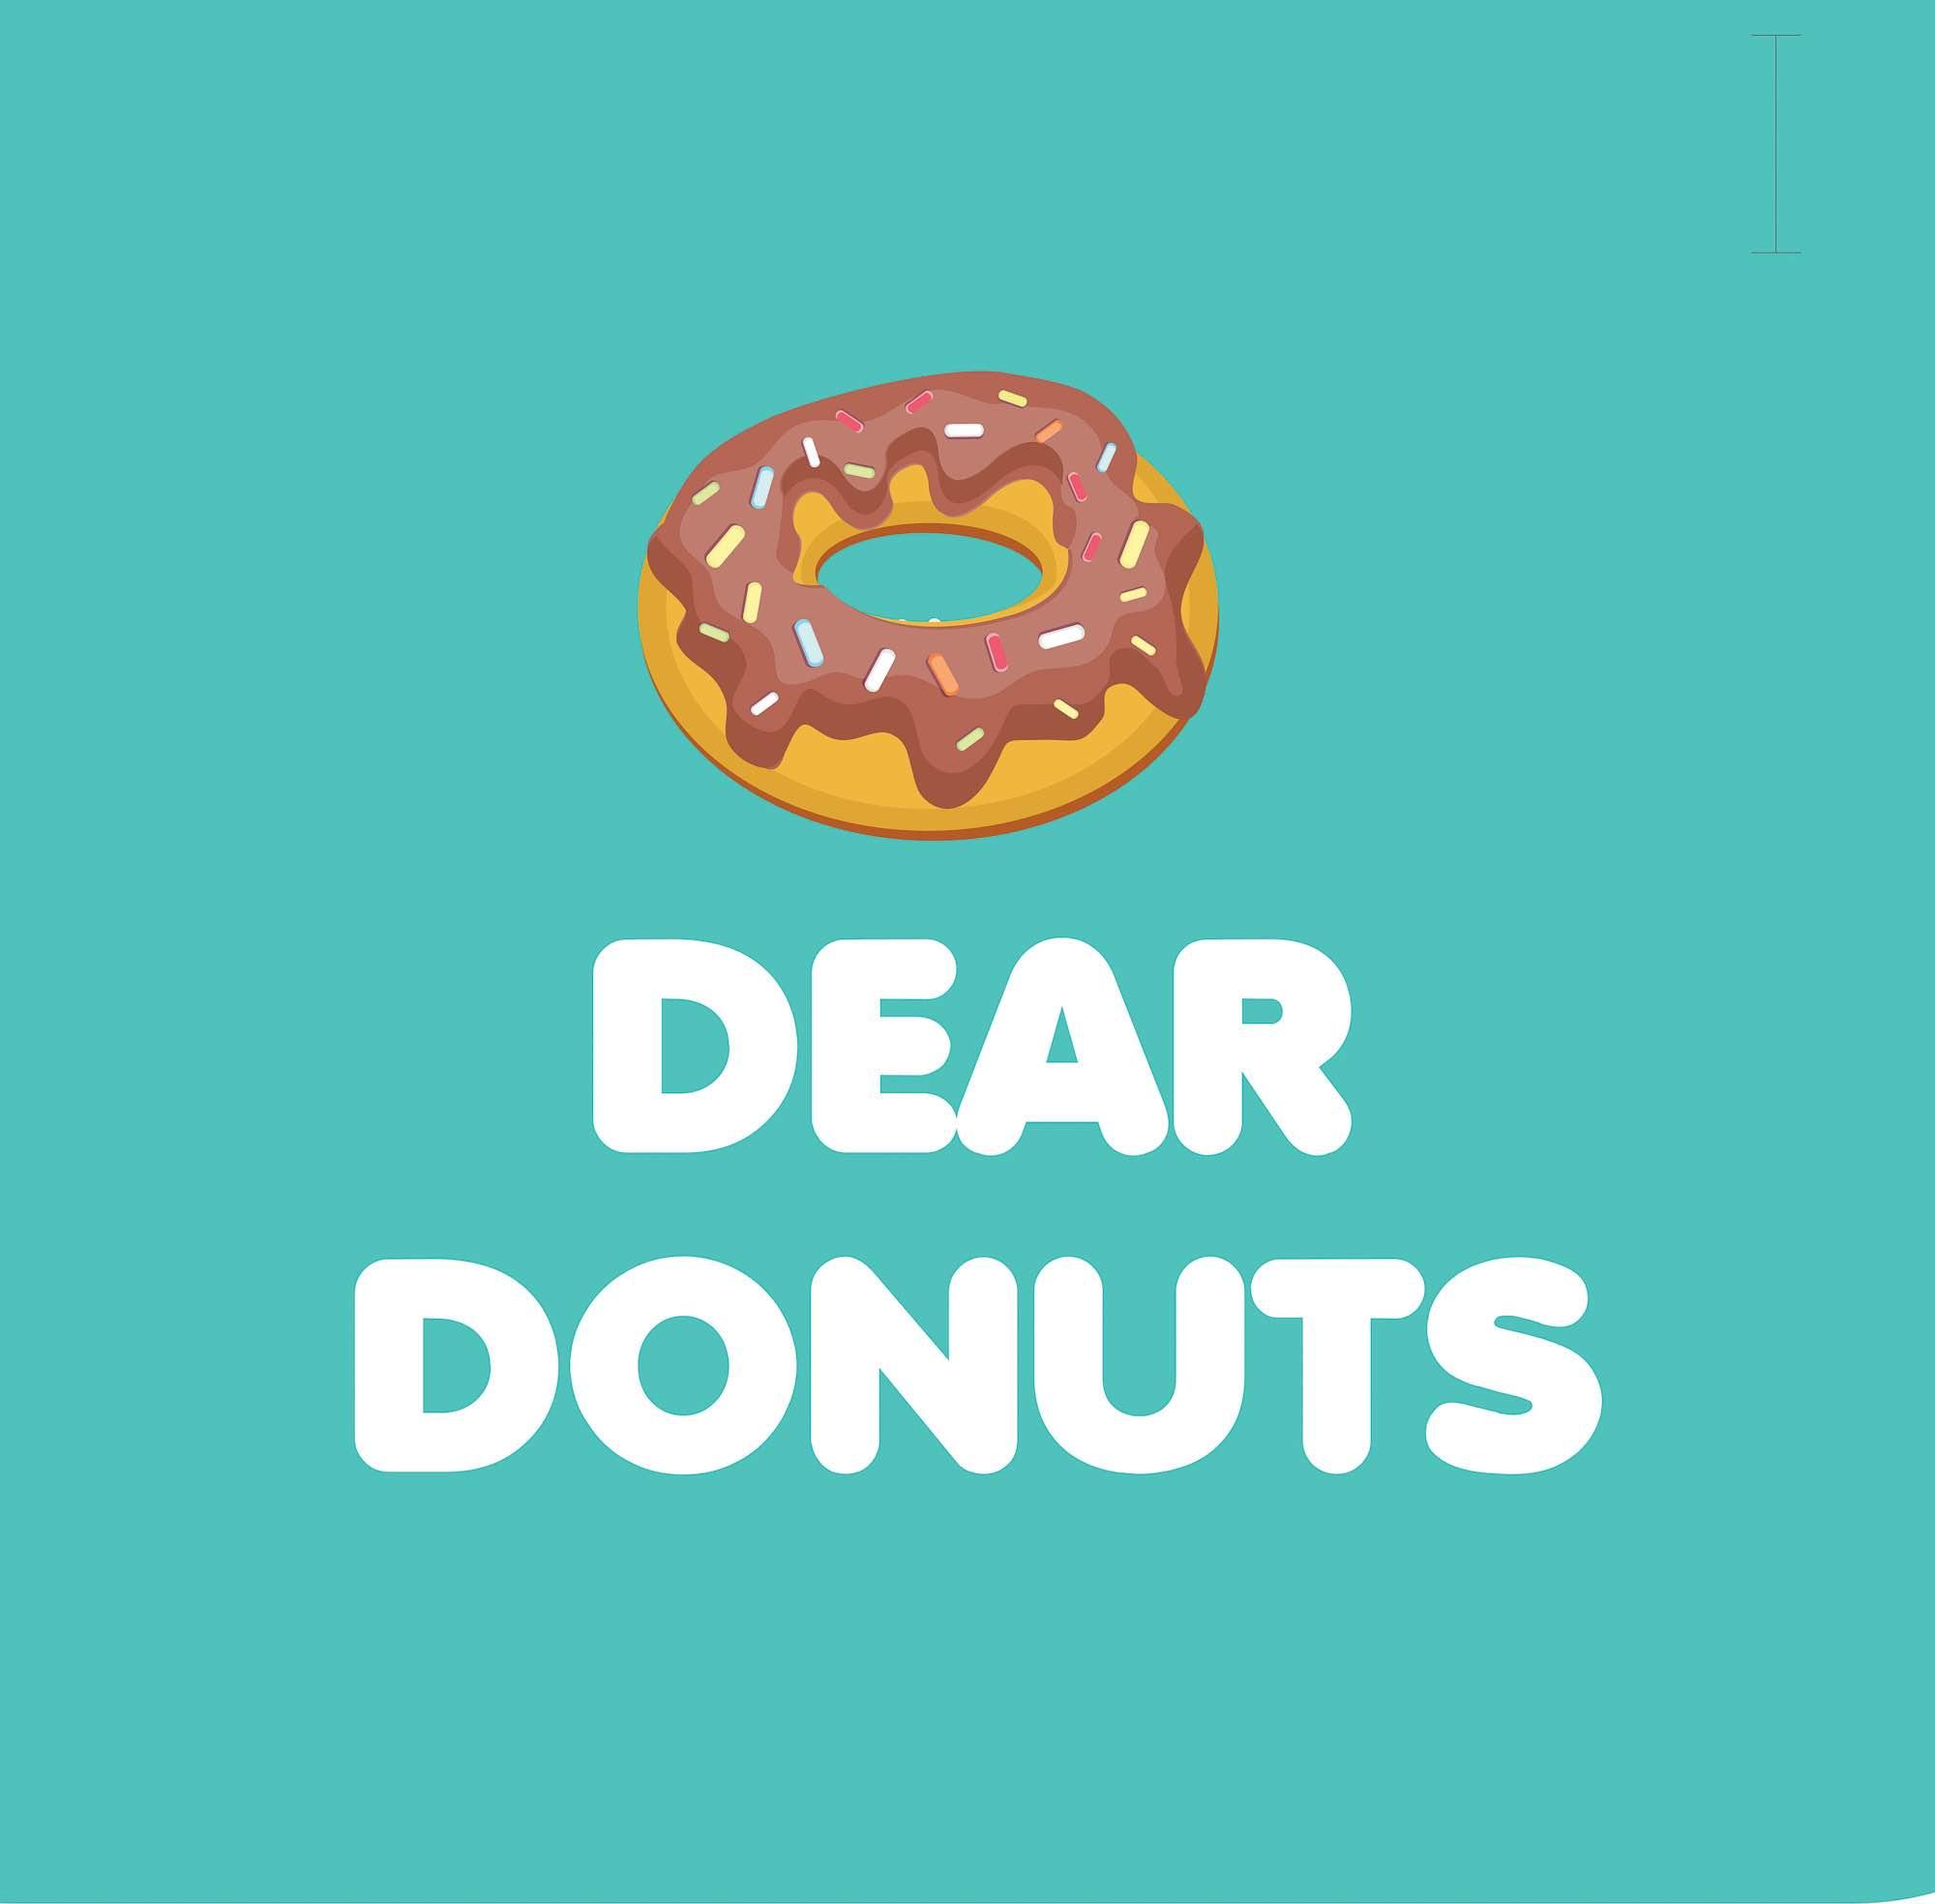 Dear Donuts